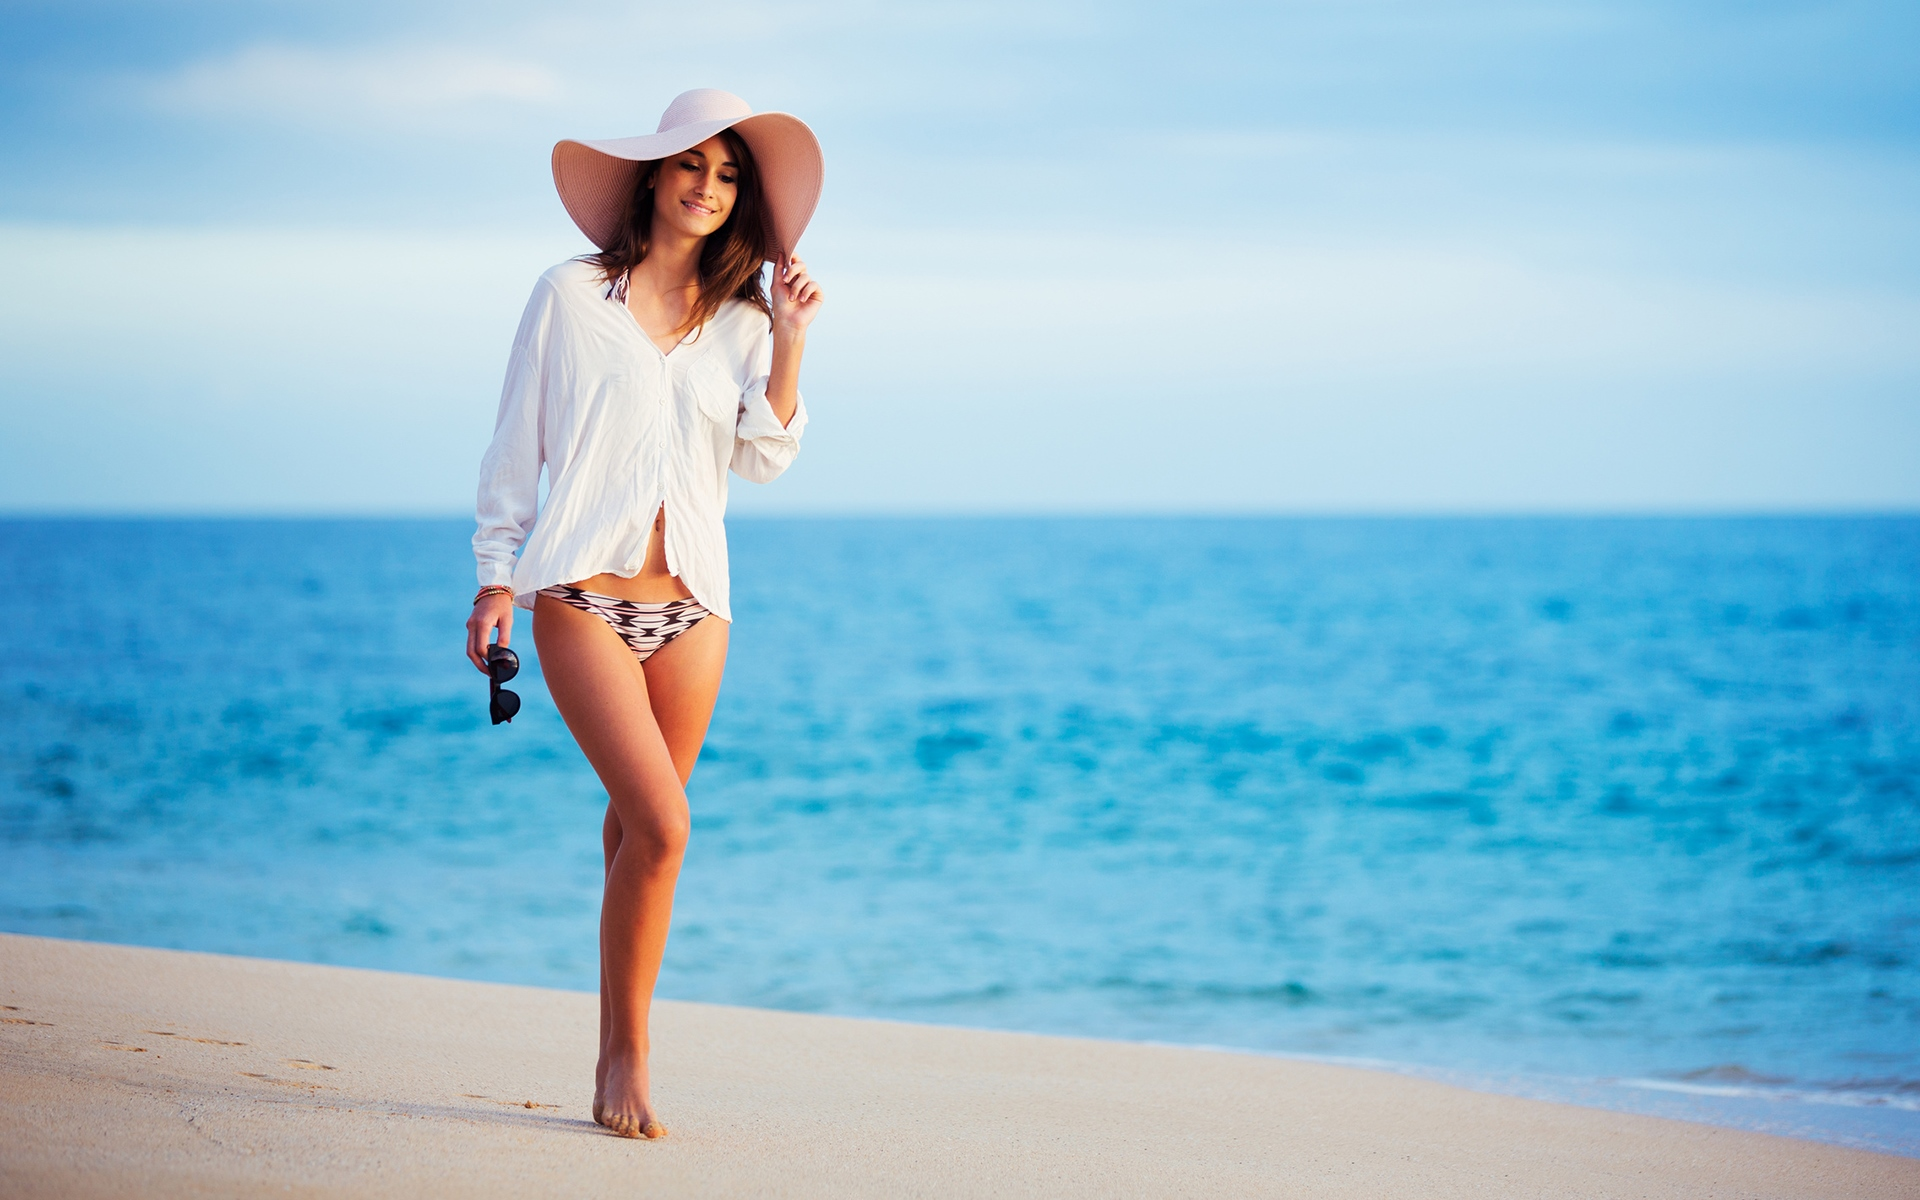 Картинки девушки летом на пляже